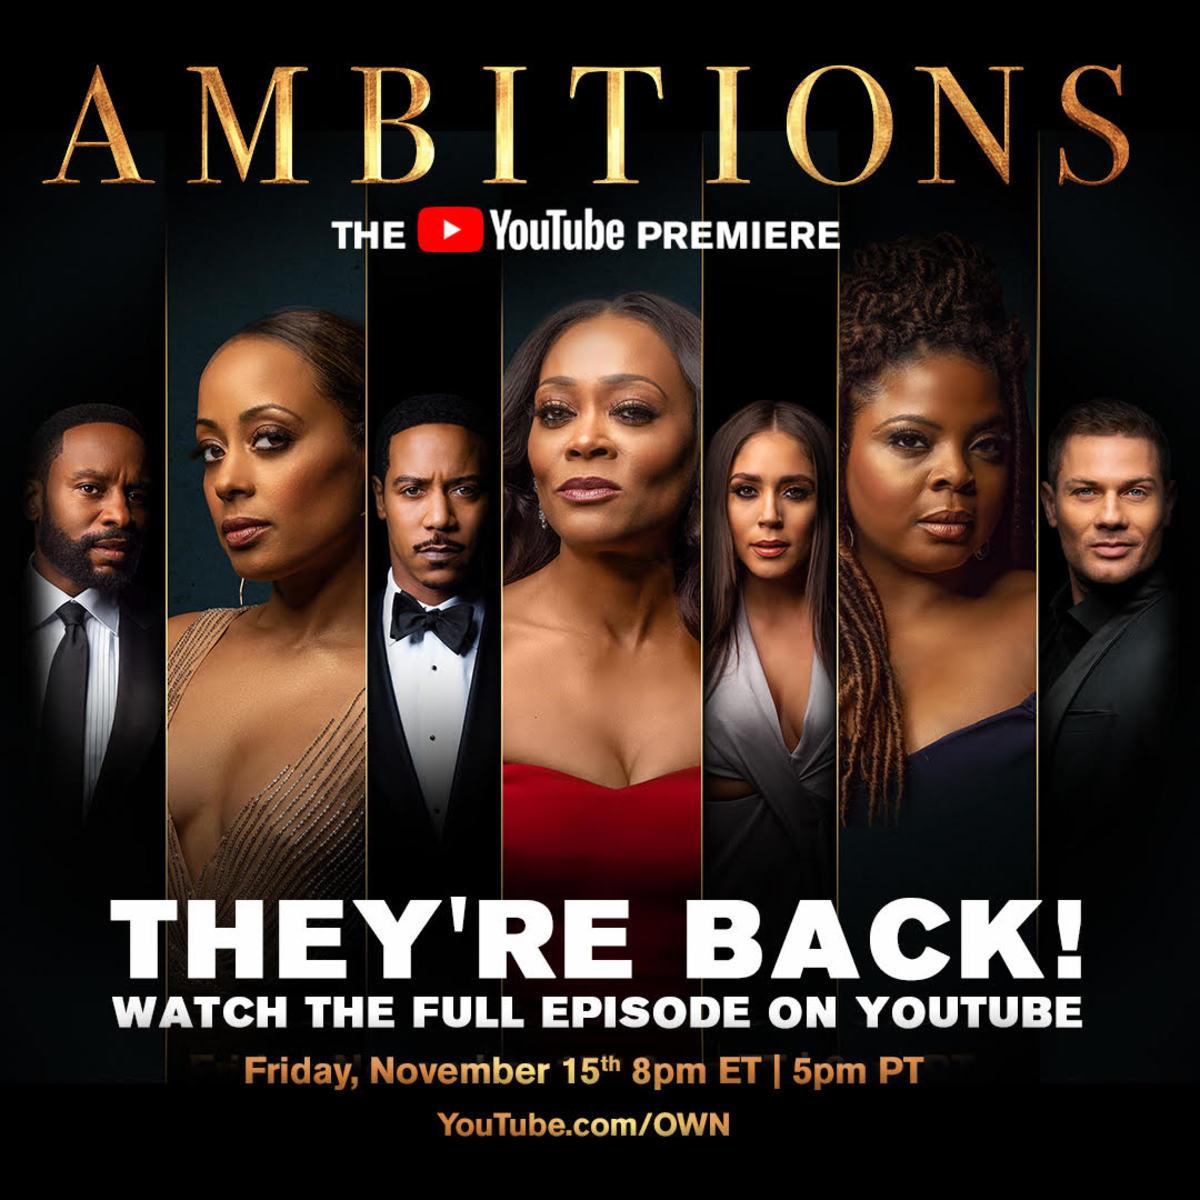 You Tube Premiere